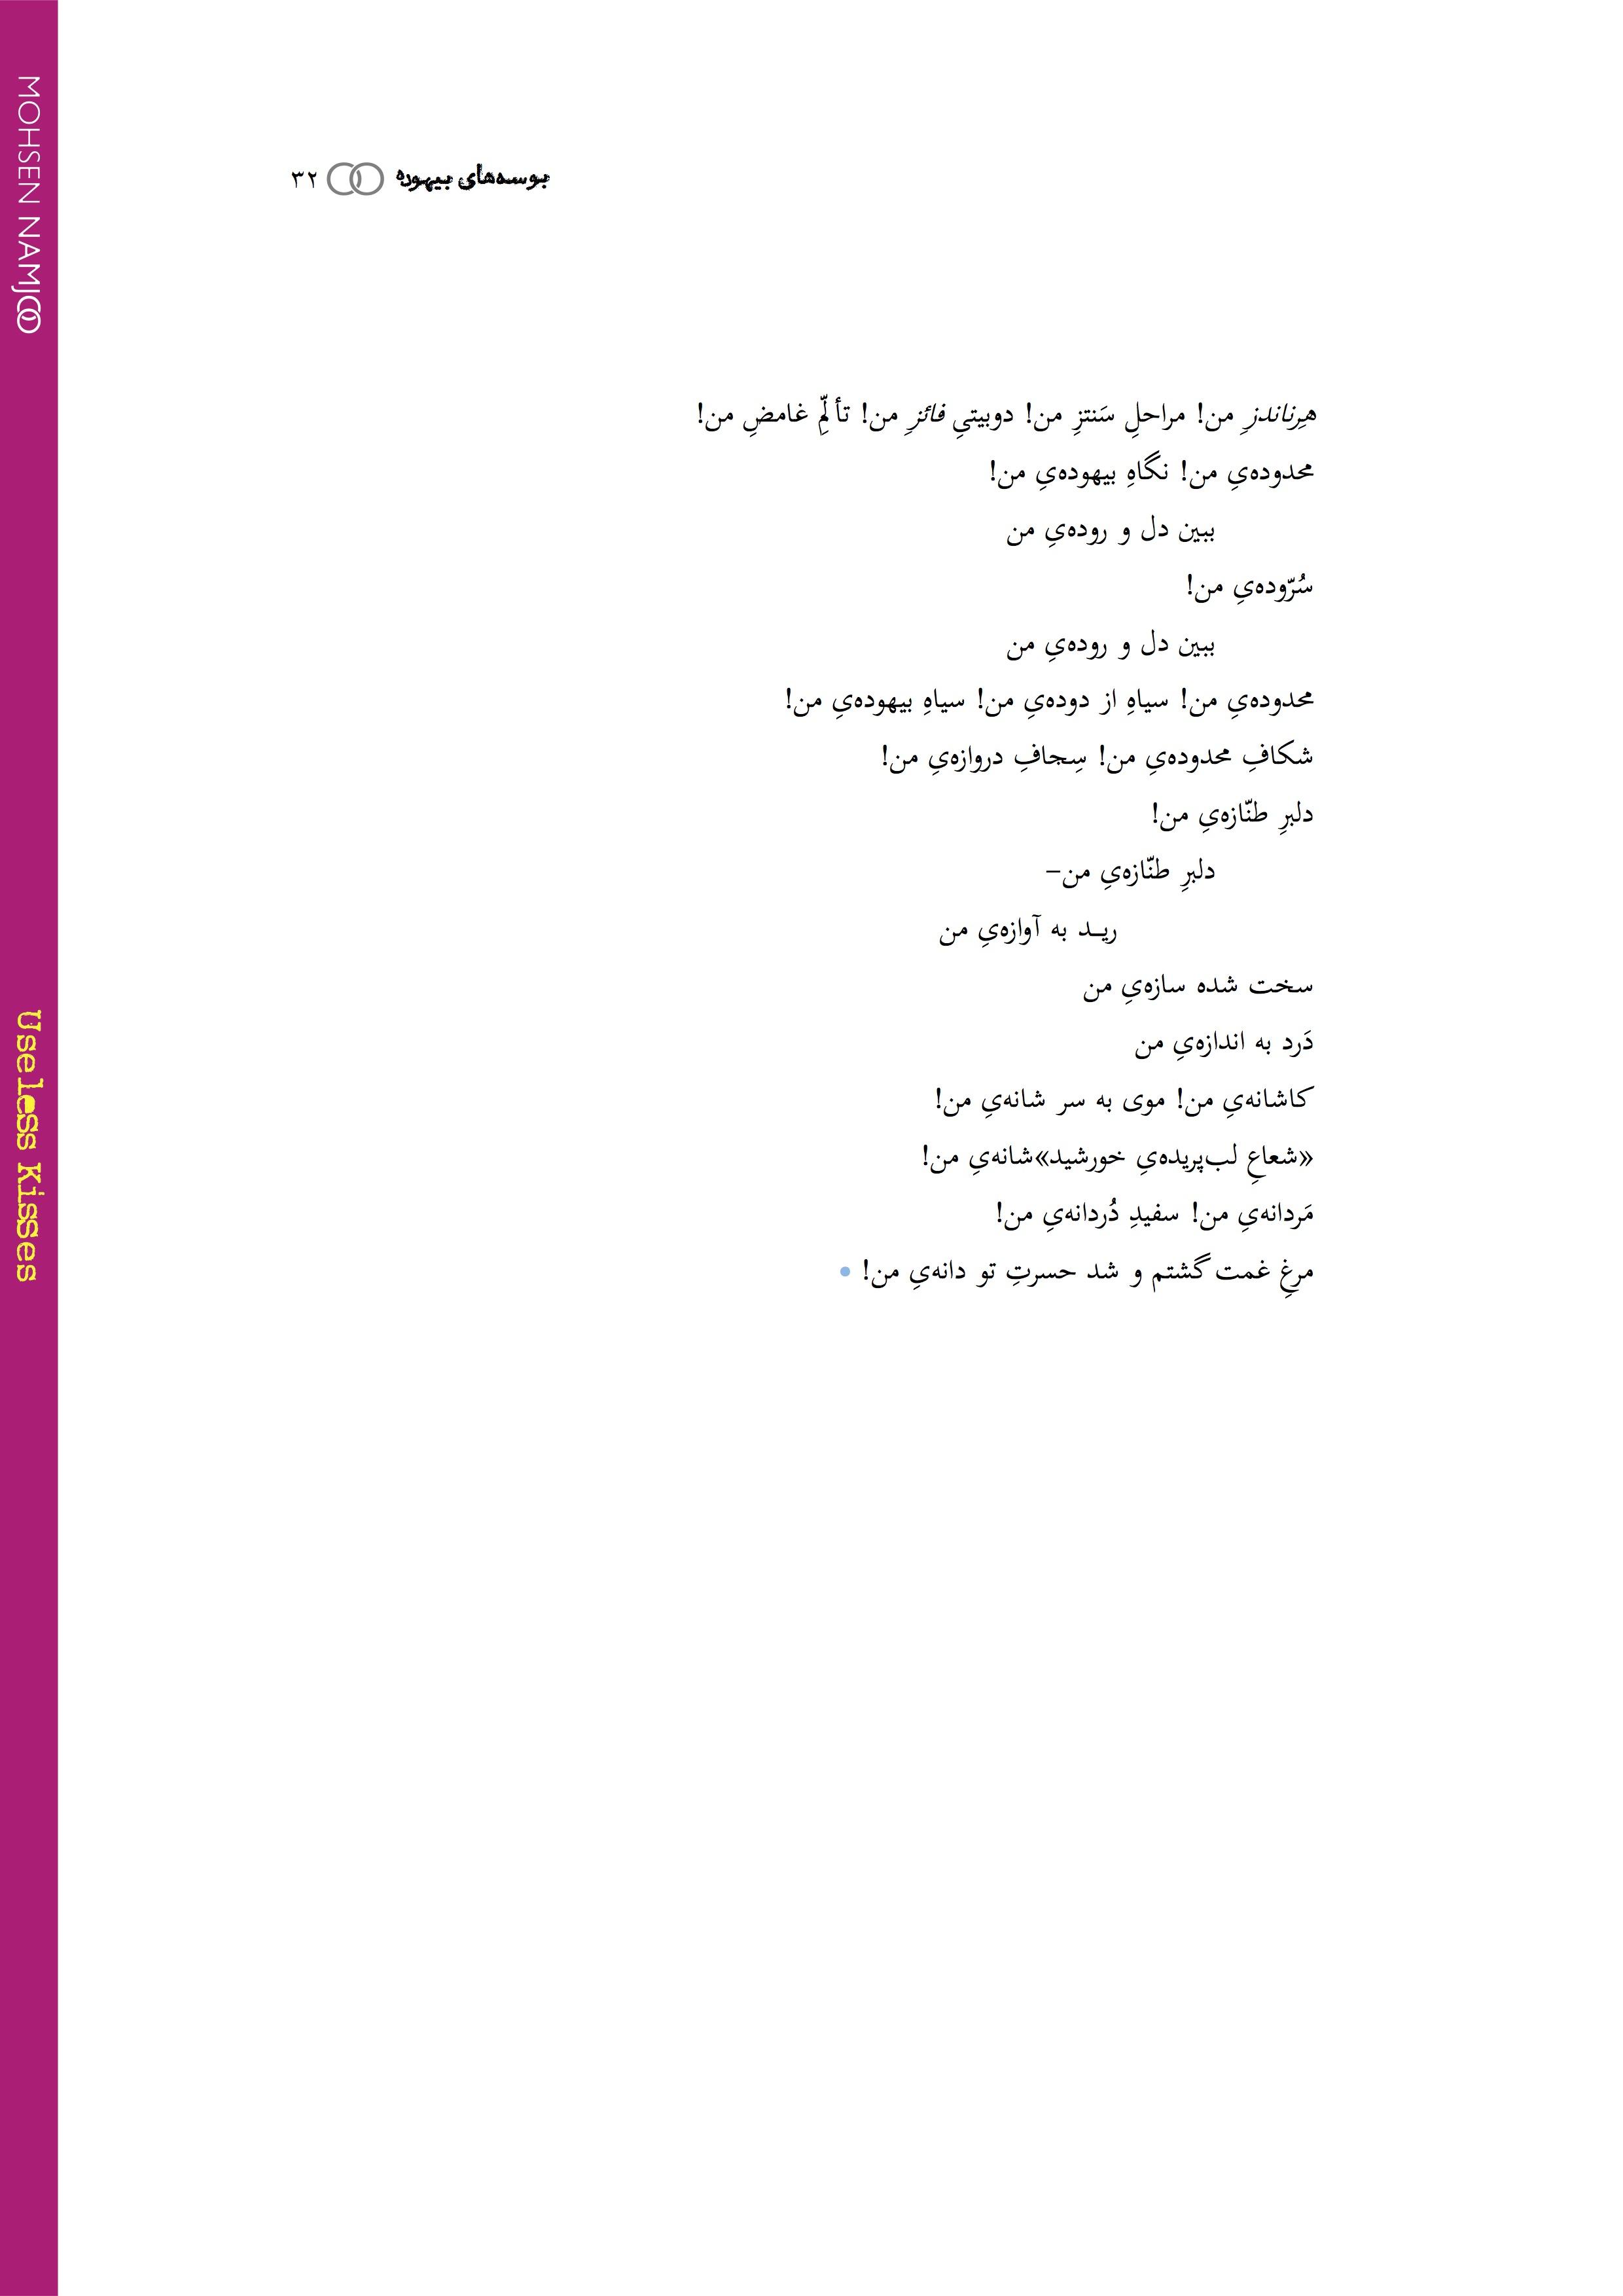 31Useless Kisses eBook (2nd Edition).jpg